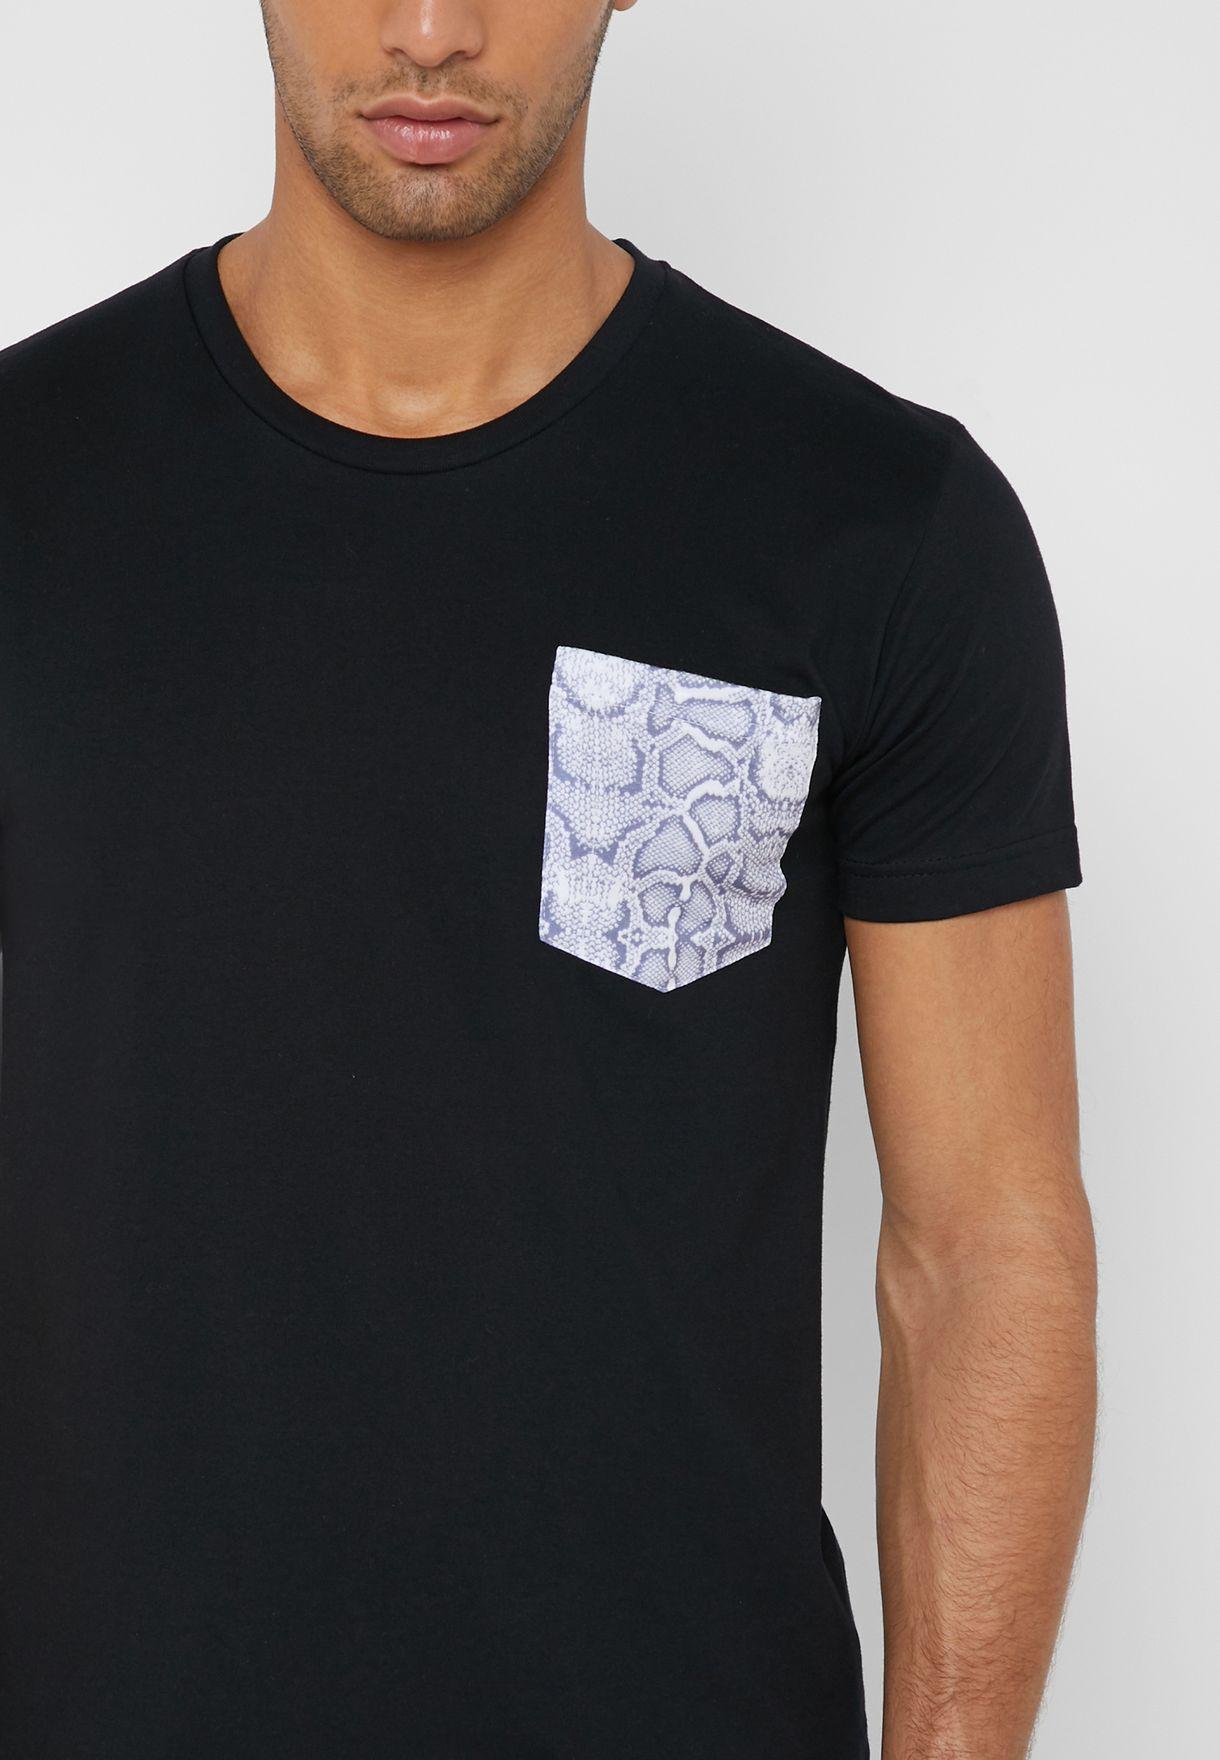 Snake Skin Pocket  Crew Neck T-Shirt